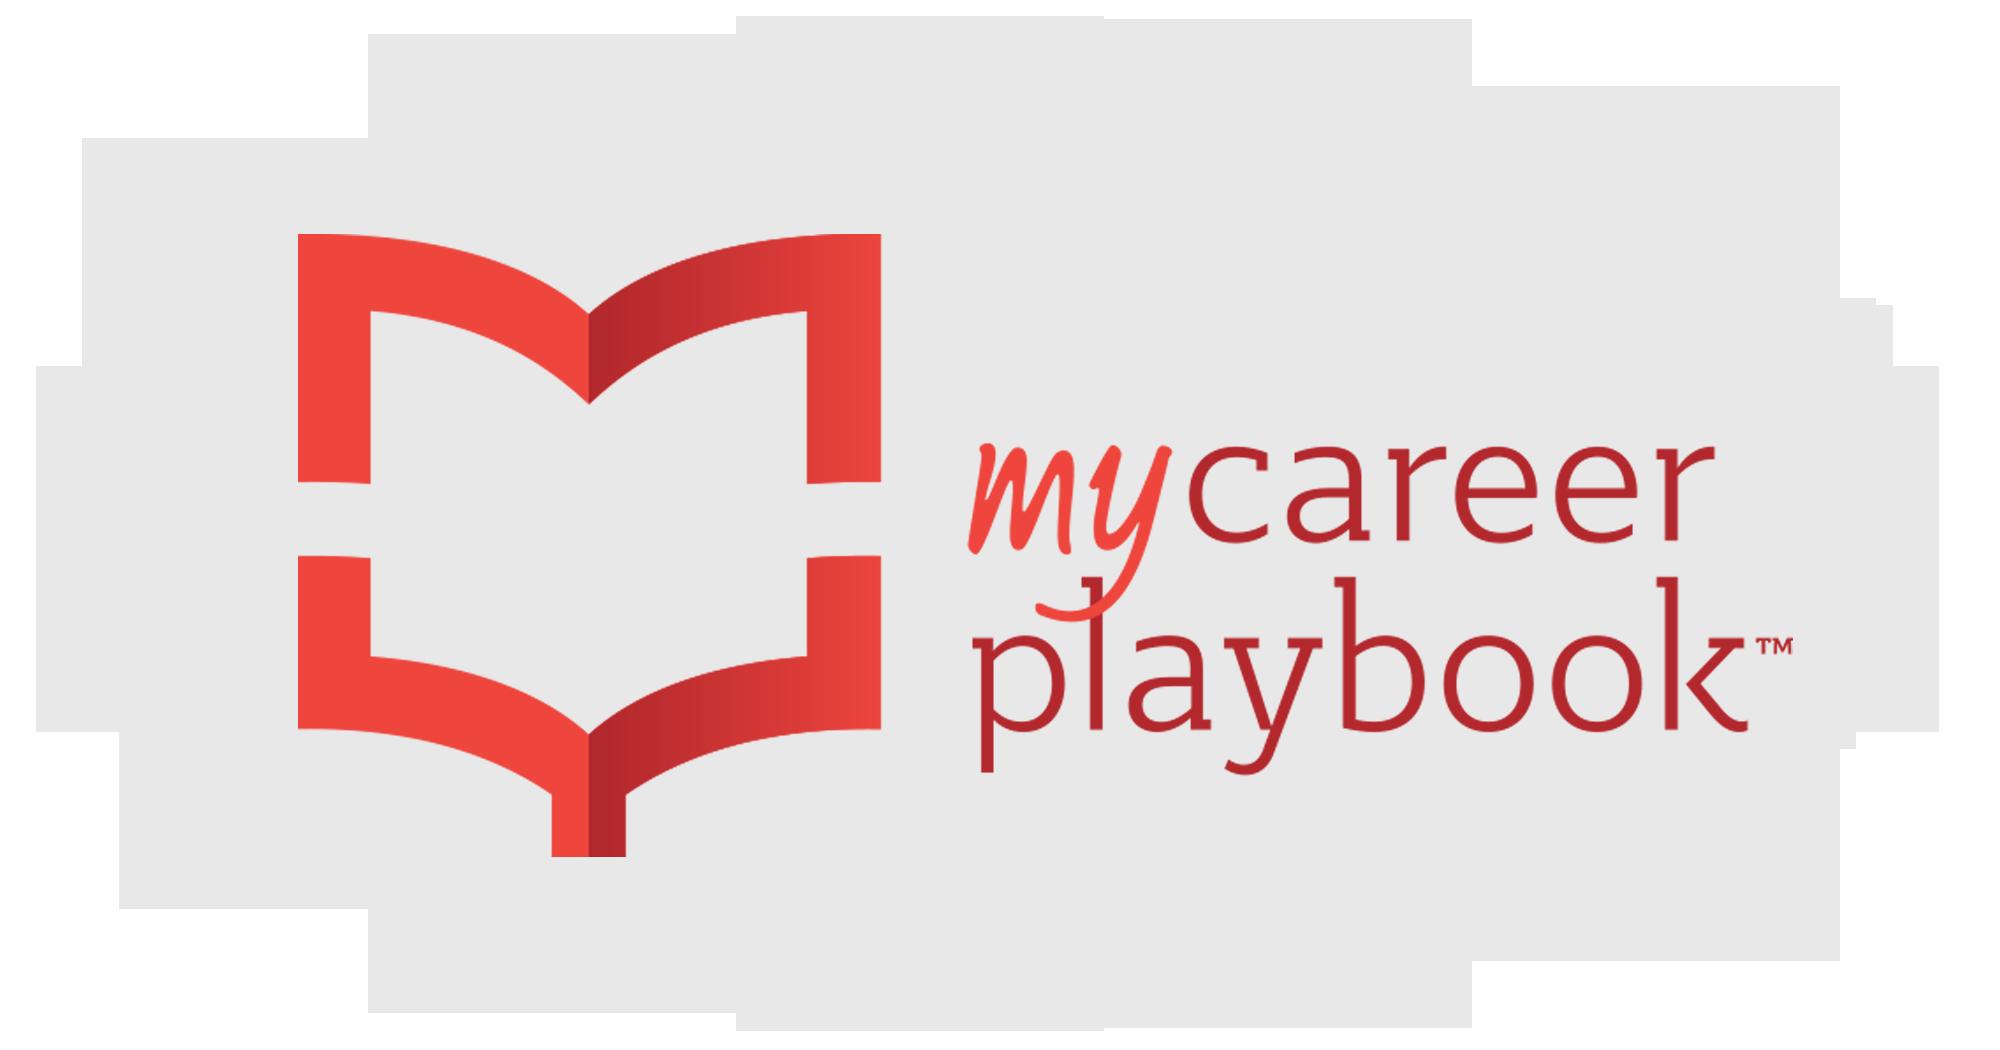 My Career Playbook